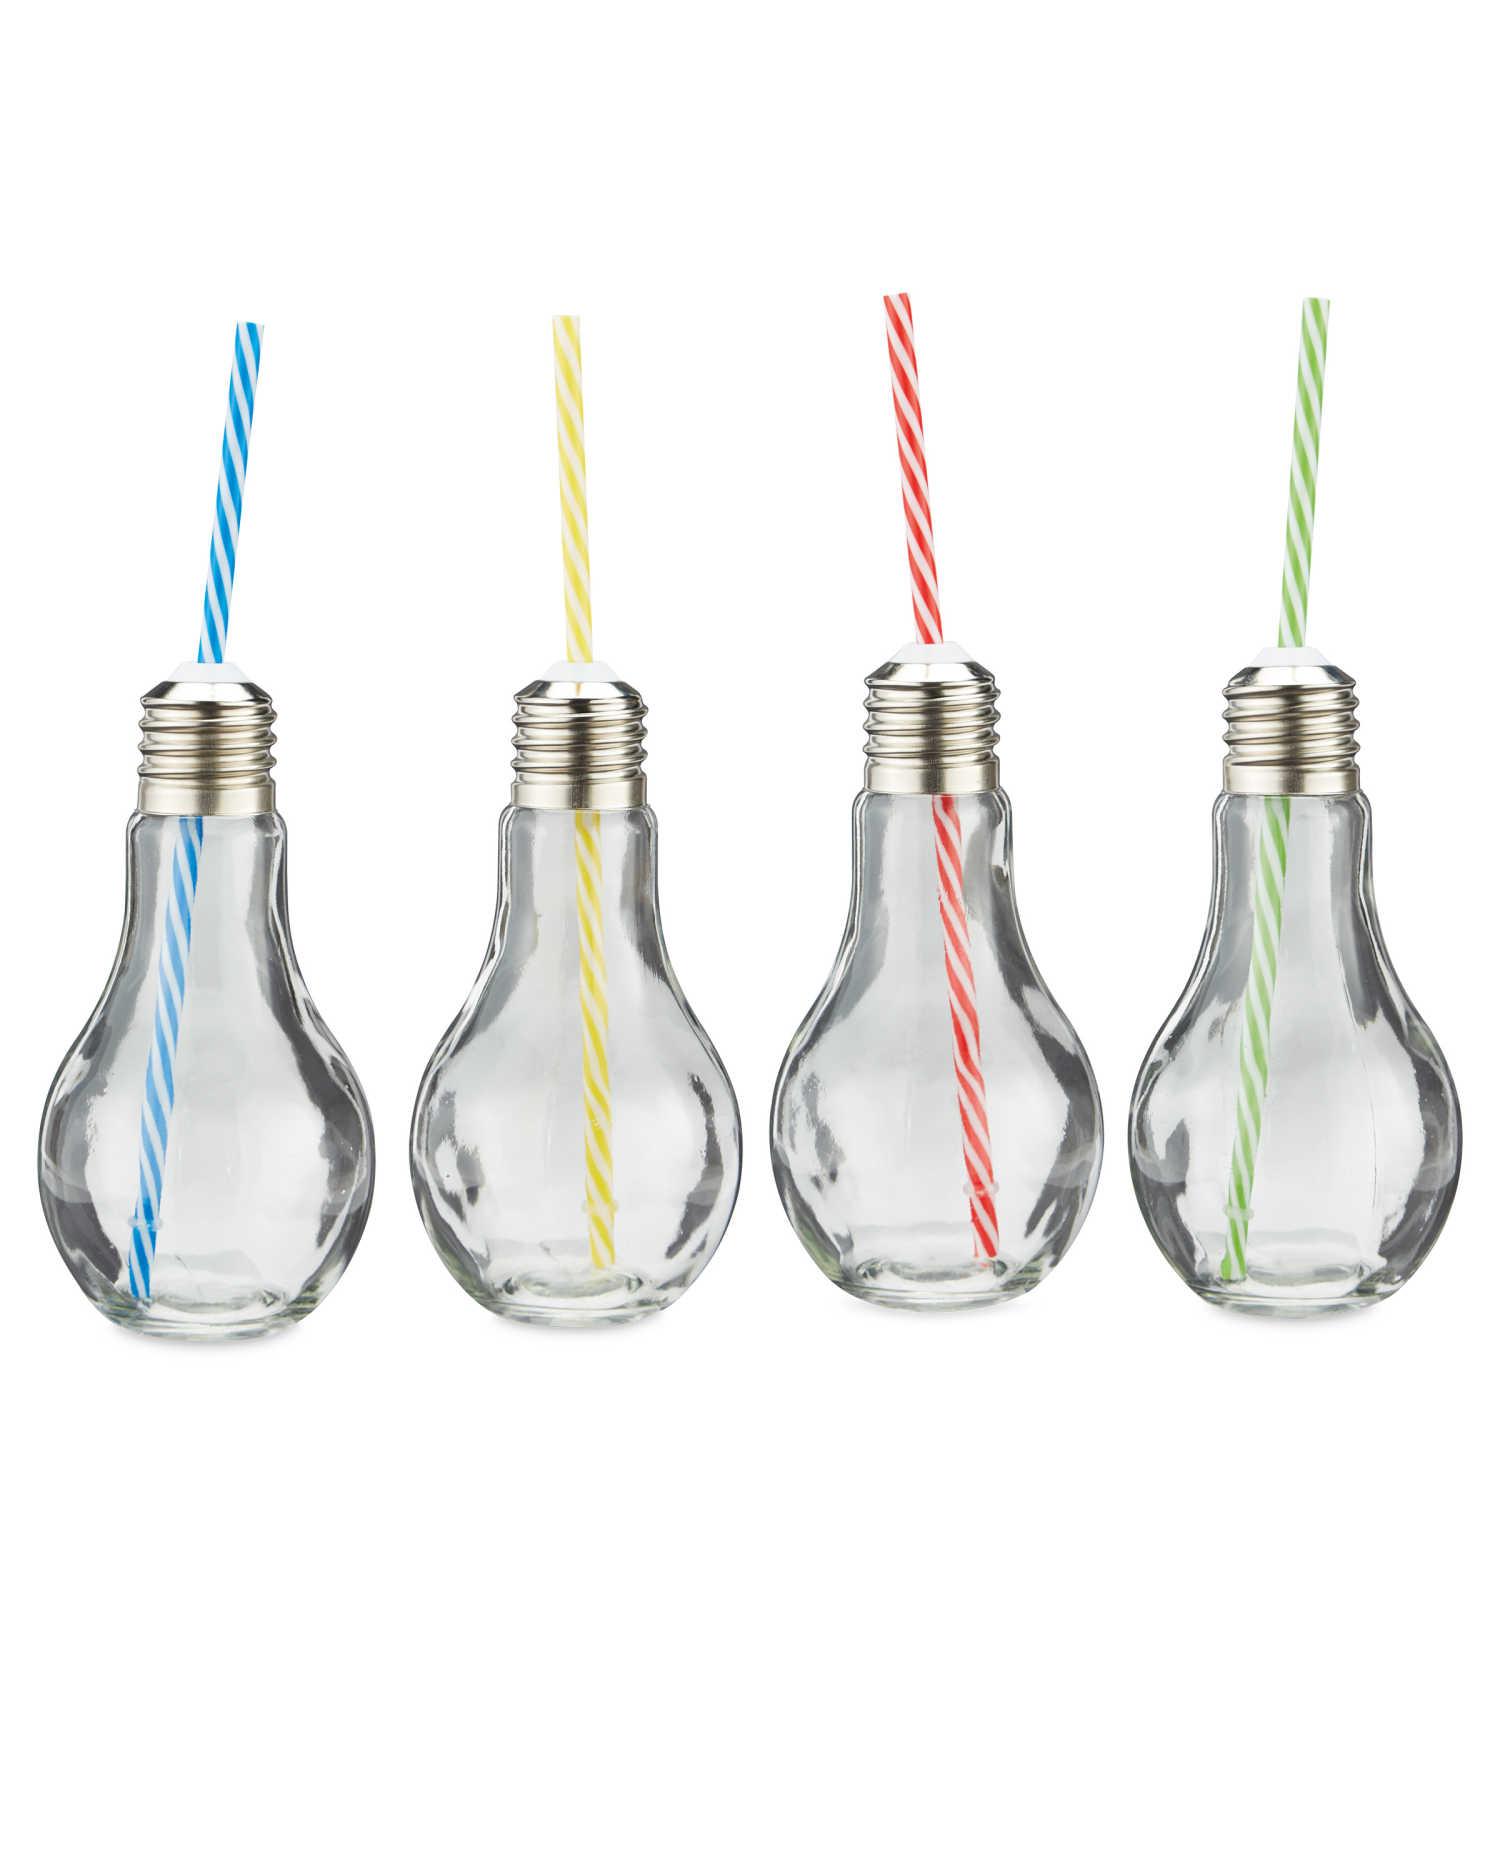 Novelty drunk ware - Light Bulb Cups £2.99 @ aldi